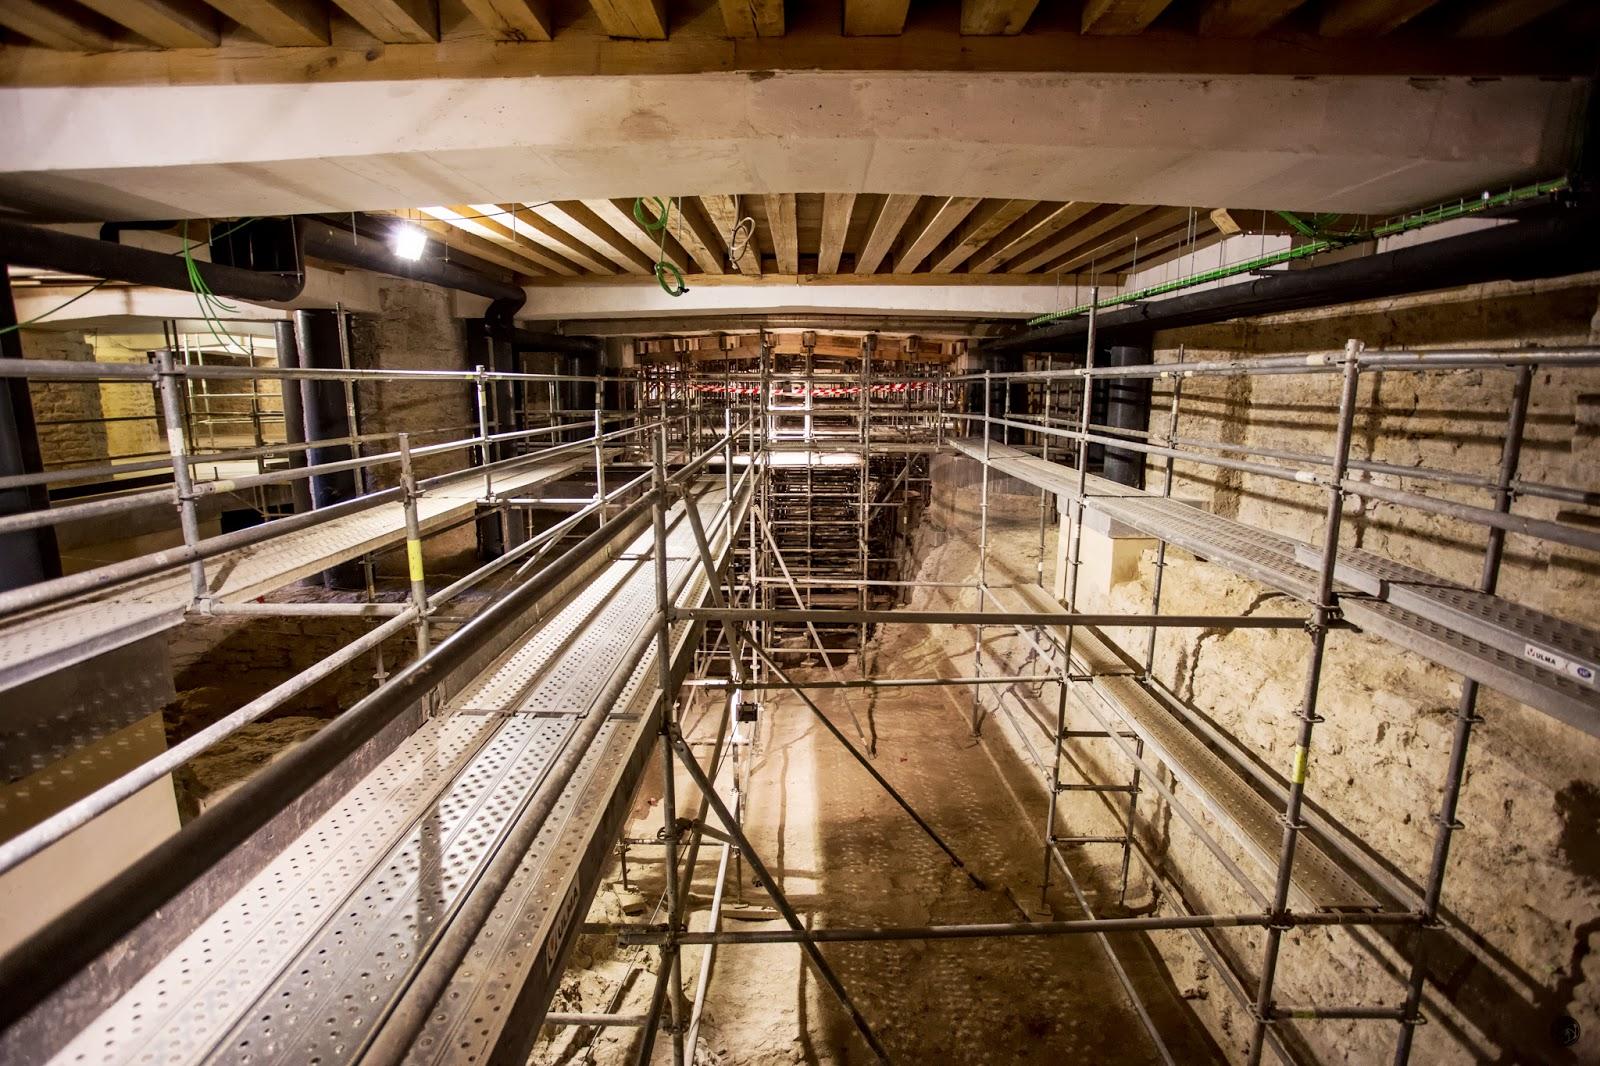 Subterráneo en proceso de acondicionado :: Canon EOS 5D MkIII | ISO3200 | Canon 17-40 @17mm | f/4.0 | 1/20s